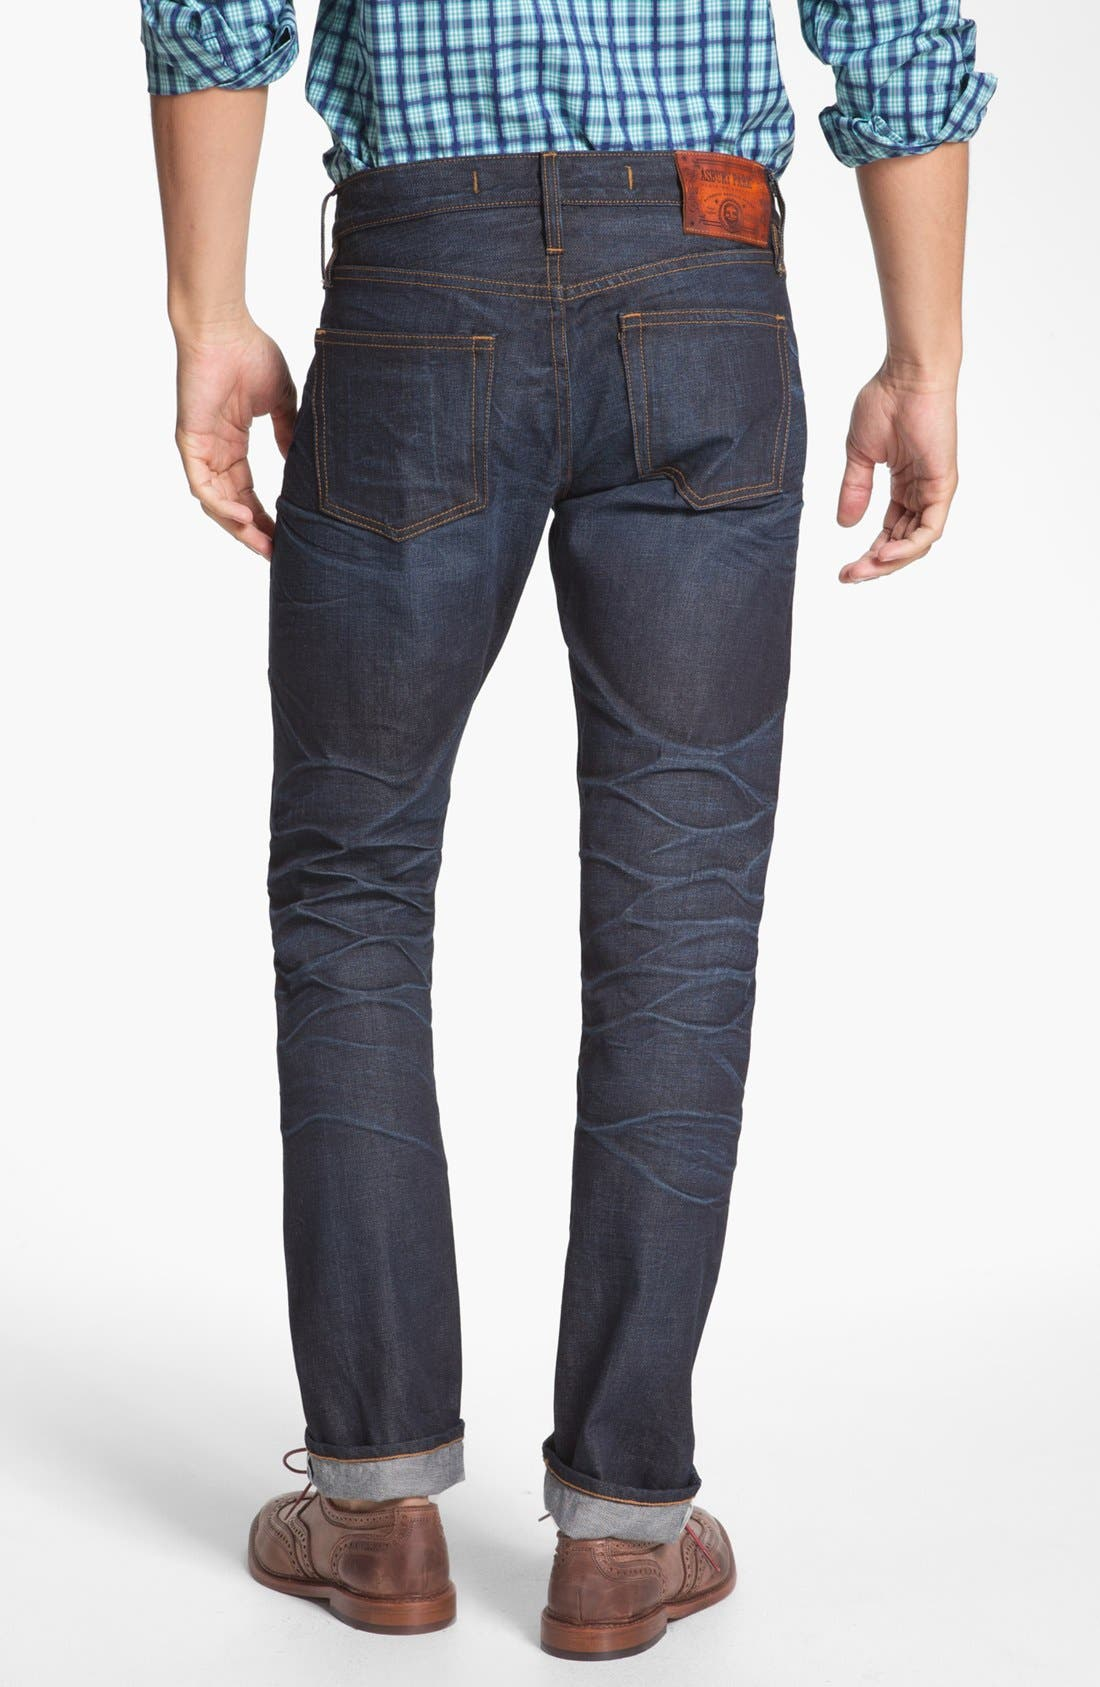 ASBURY PARK,                             '1888 Skinny Fit' Raw Selvedge Jeans,                             Alternate thumbnail 6, color,                             401